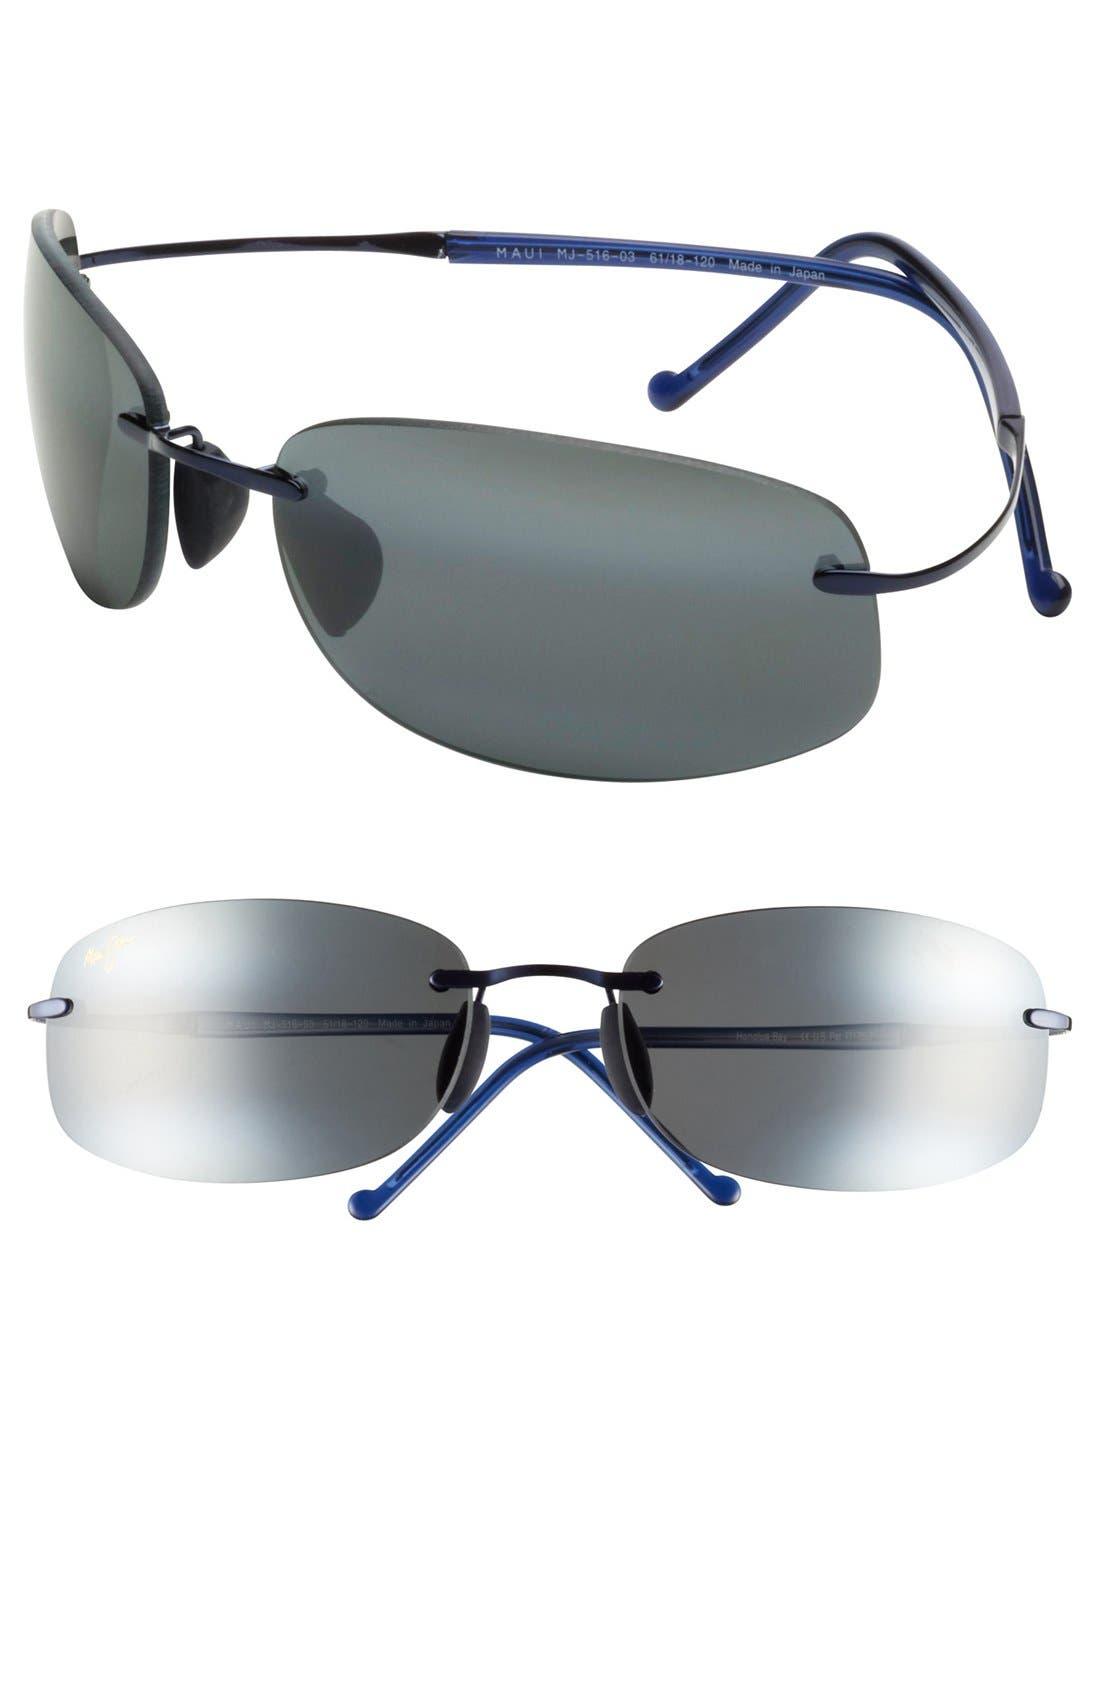 Main Image - Maui Jim 'Honolua Bay' 61mm Hingeless Sunglasses